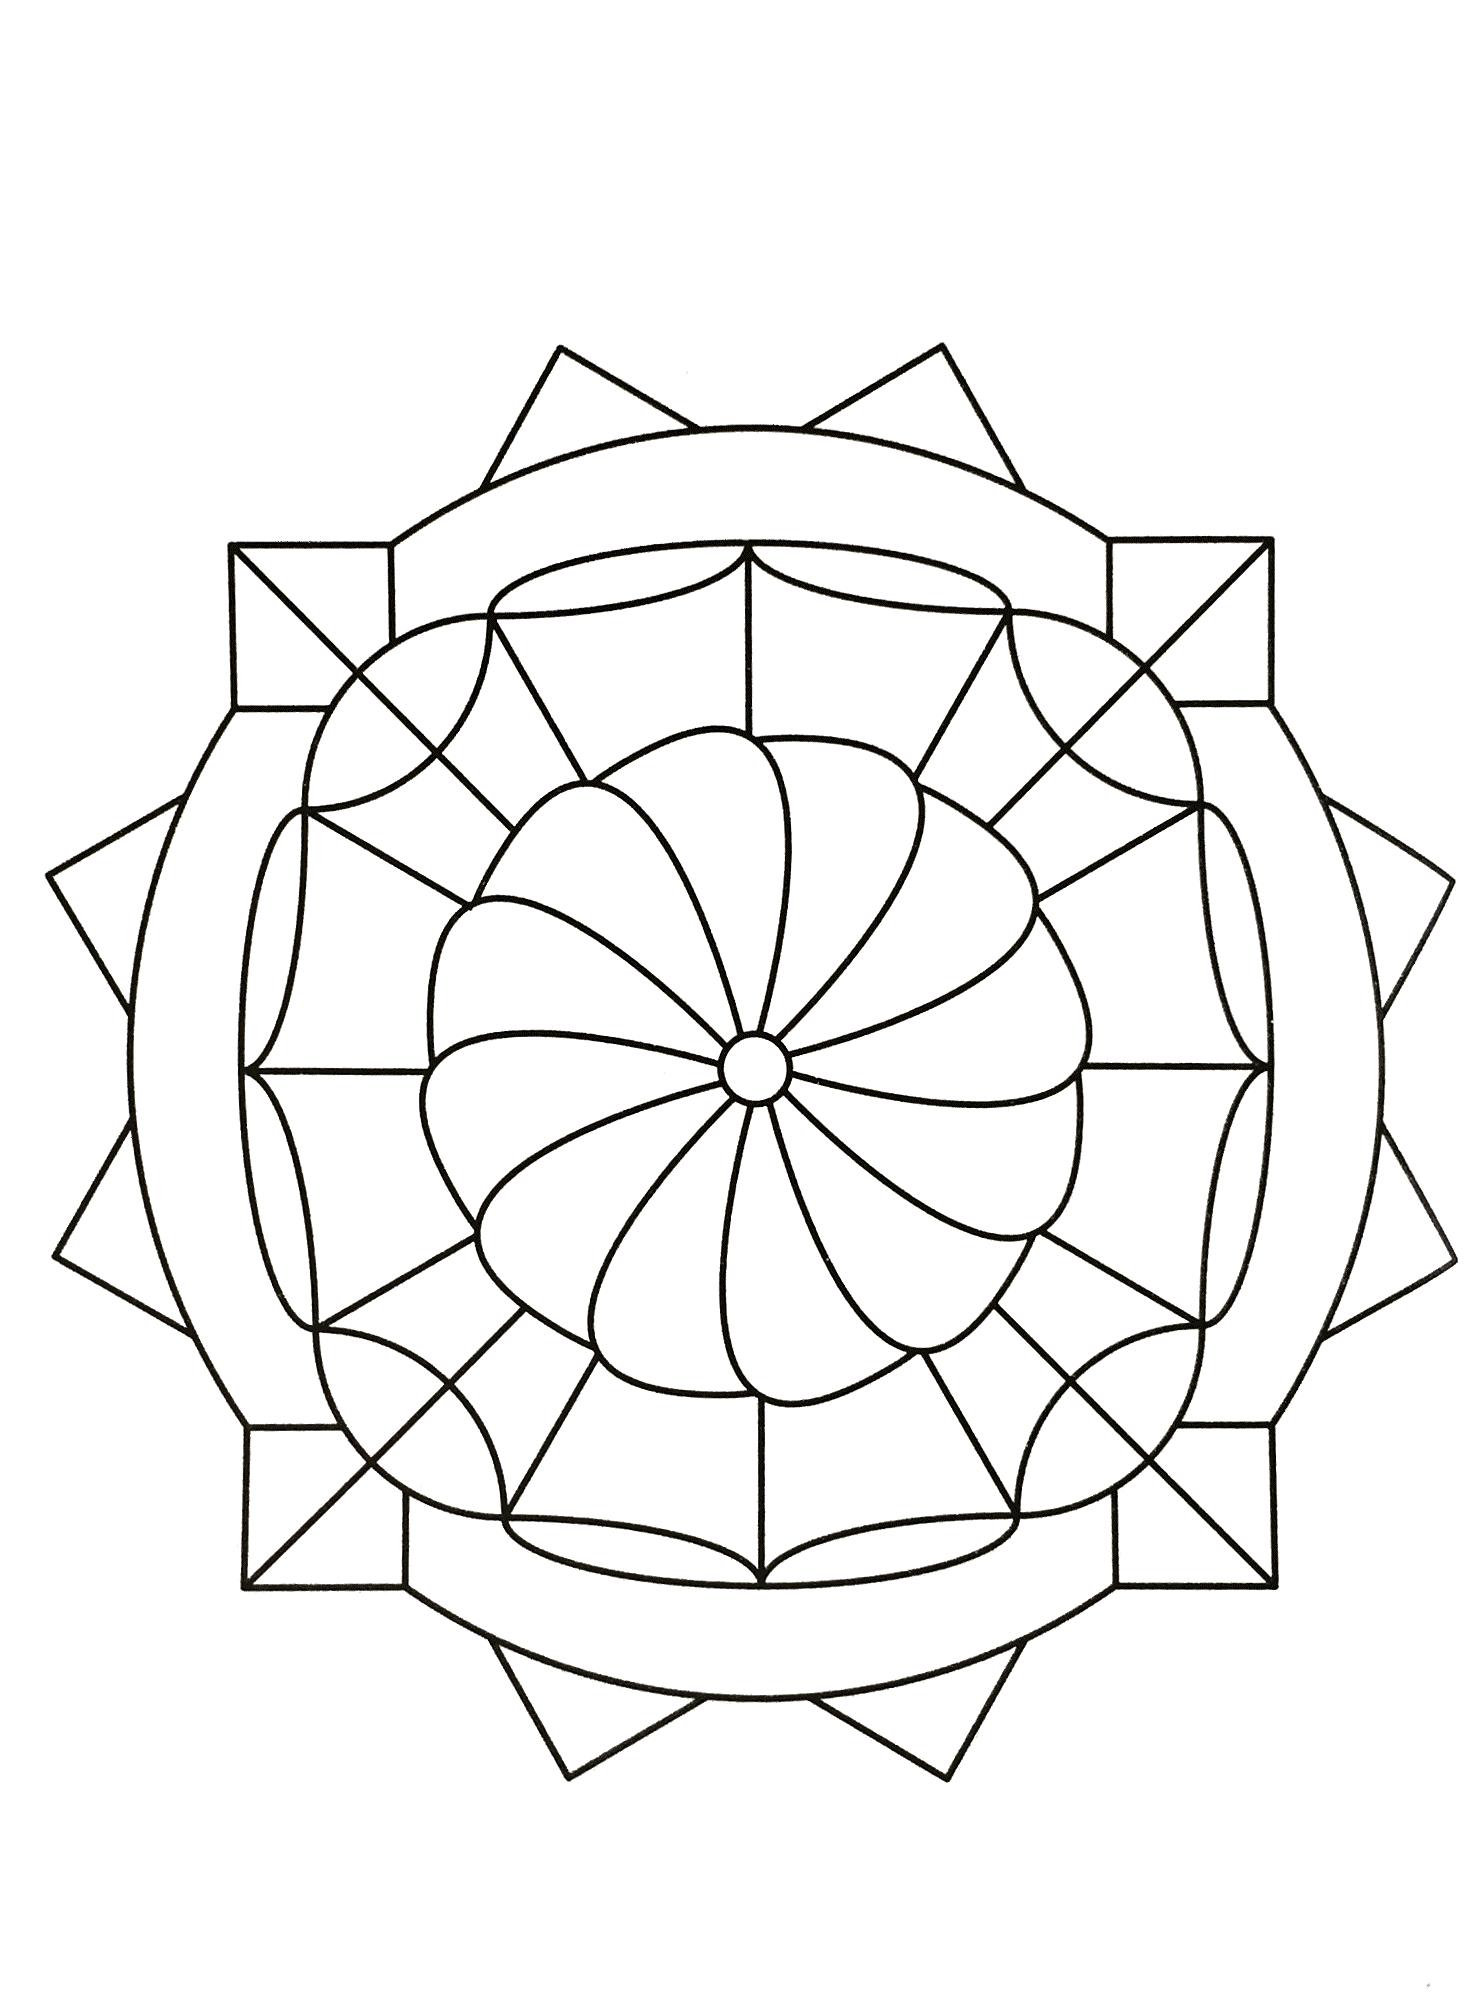 Coloriage Anti Stress Facile A Imprimer.Mandalas A Imprimer Gratuit 52 Mandalas De Difficulte